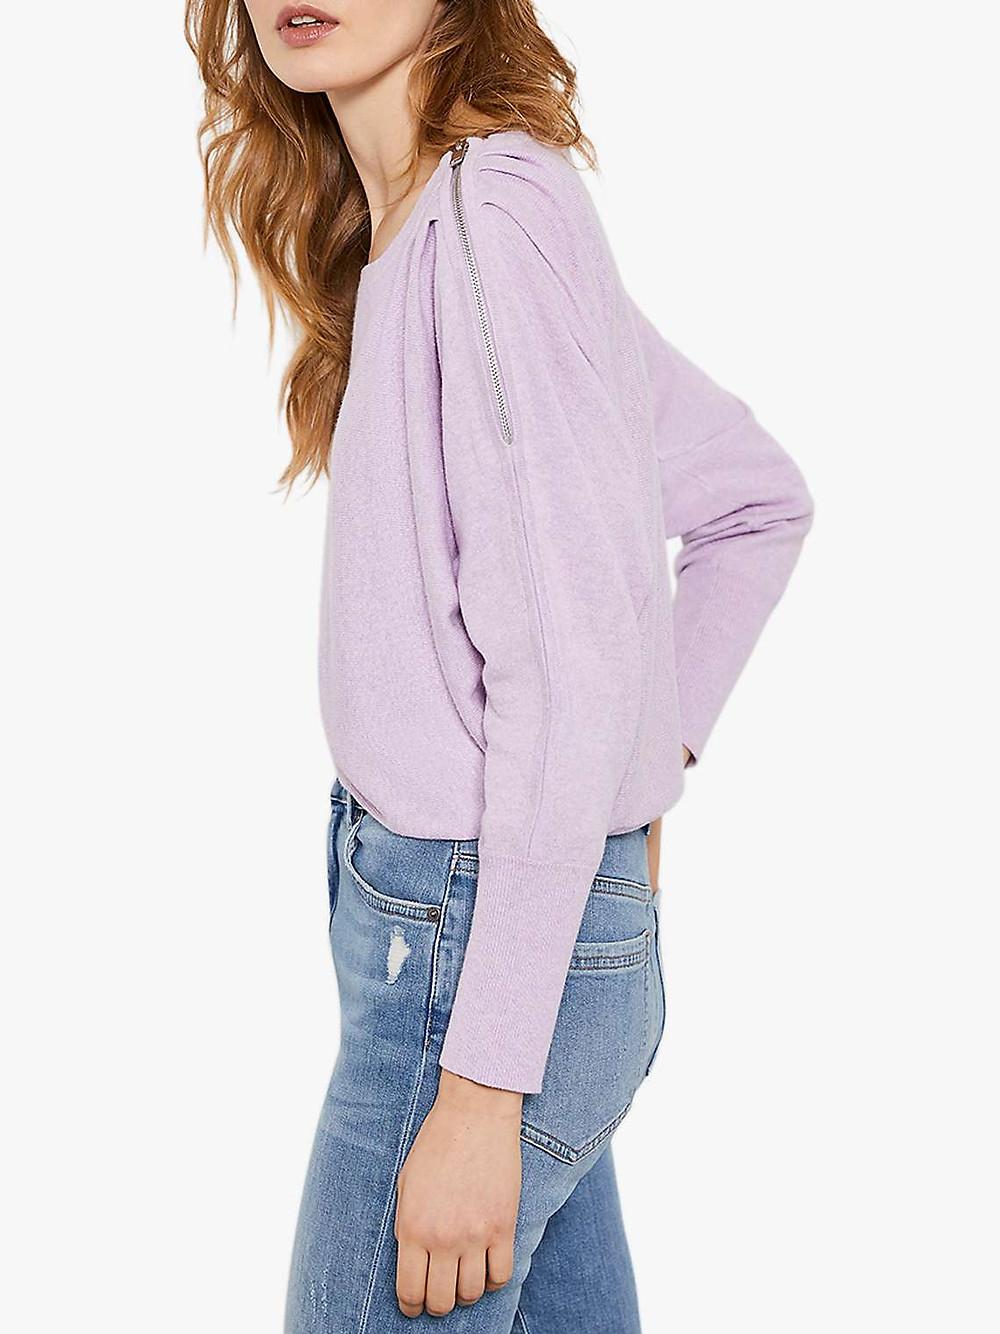 mint velvet light purple lilac batwing top